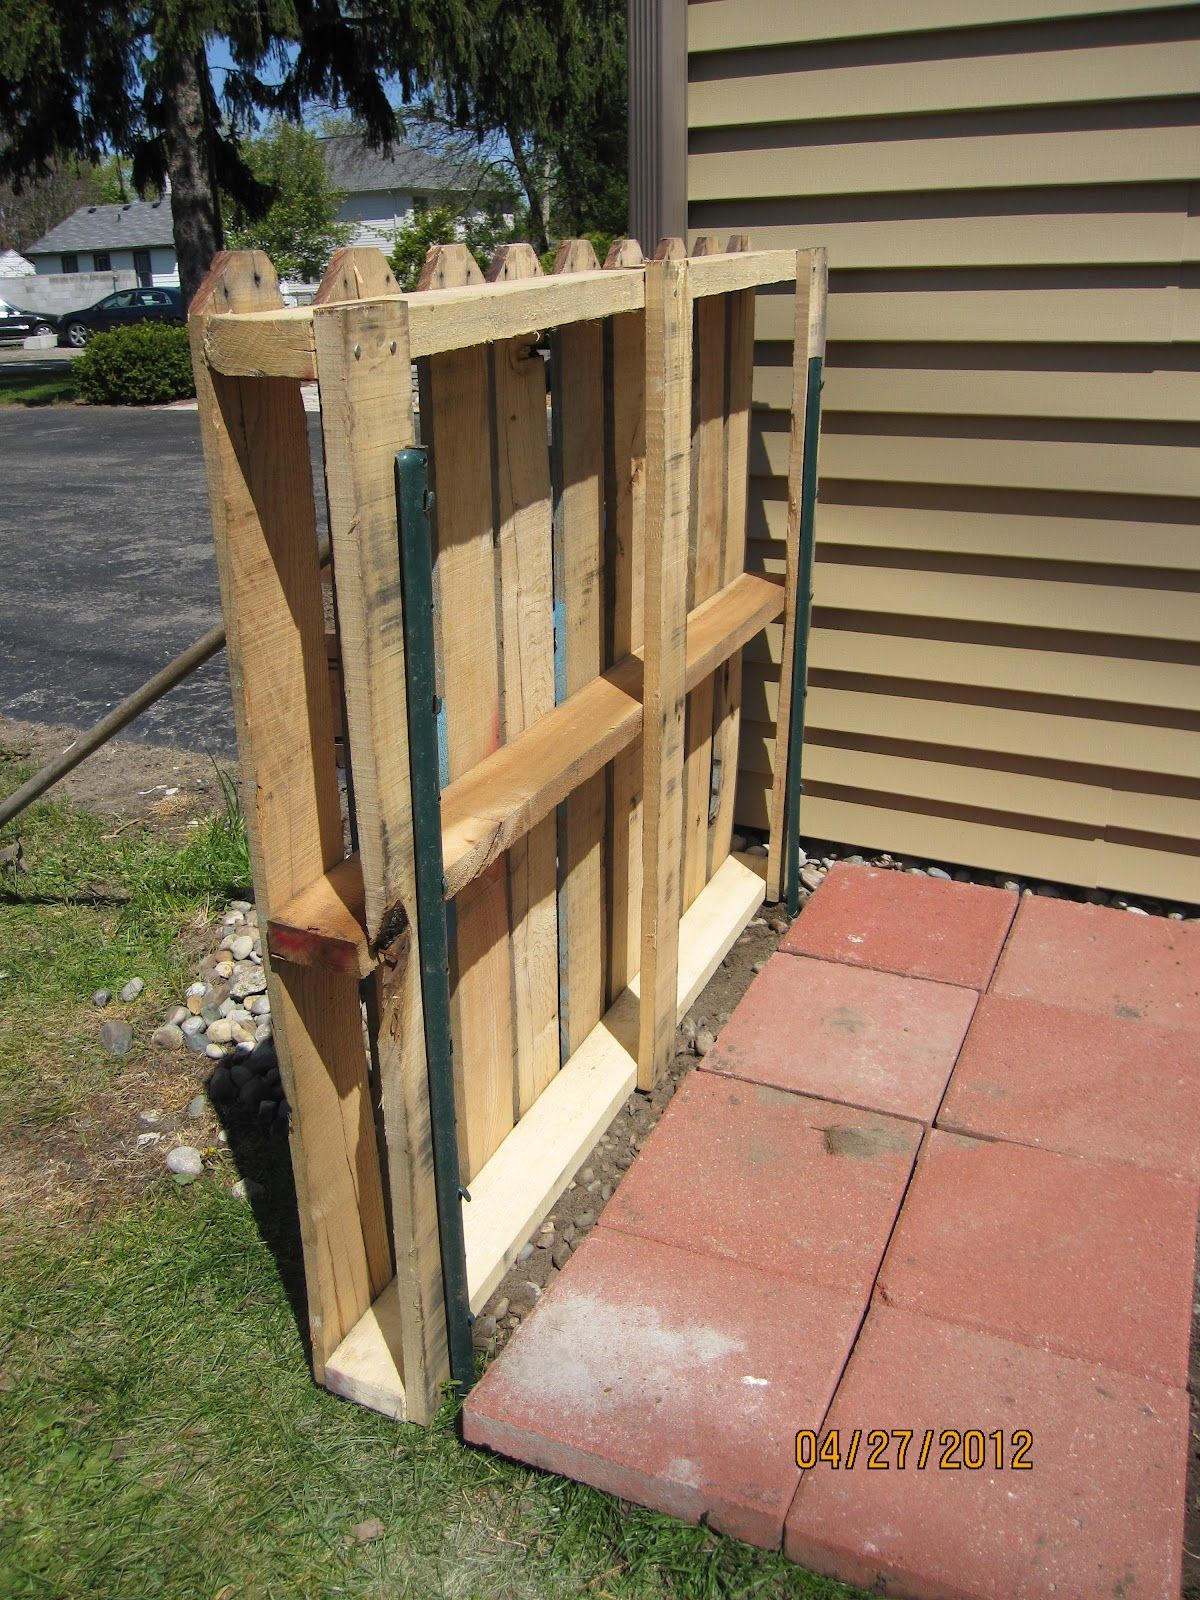 Pallet fence projects serendipity and sunshine trash to treasure pallet fence project - Faire une cloture en palette ...